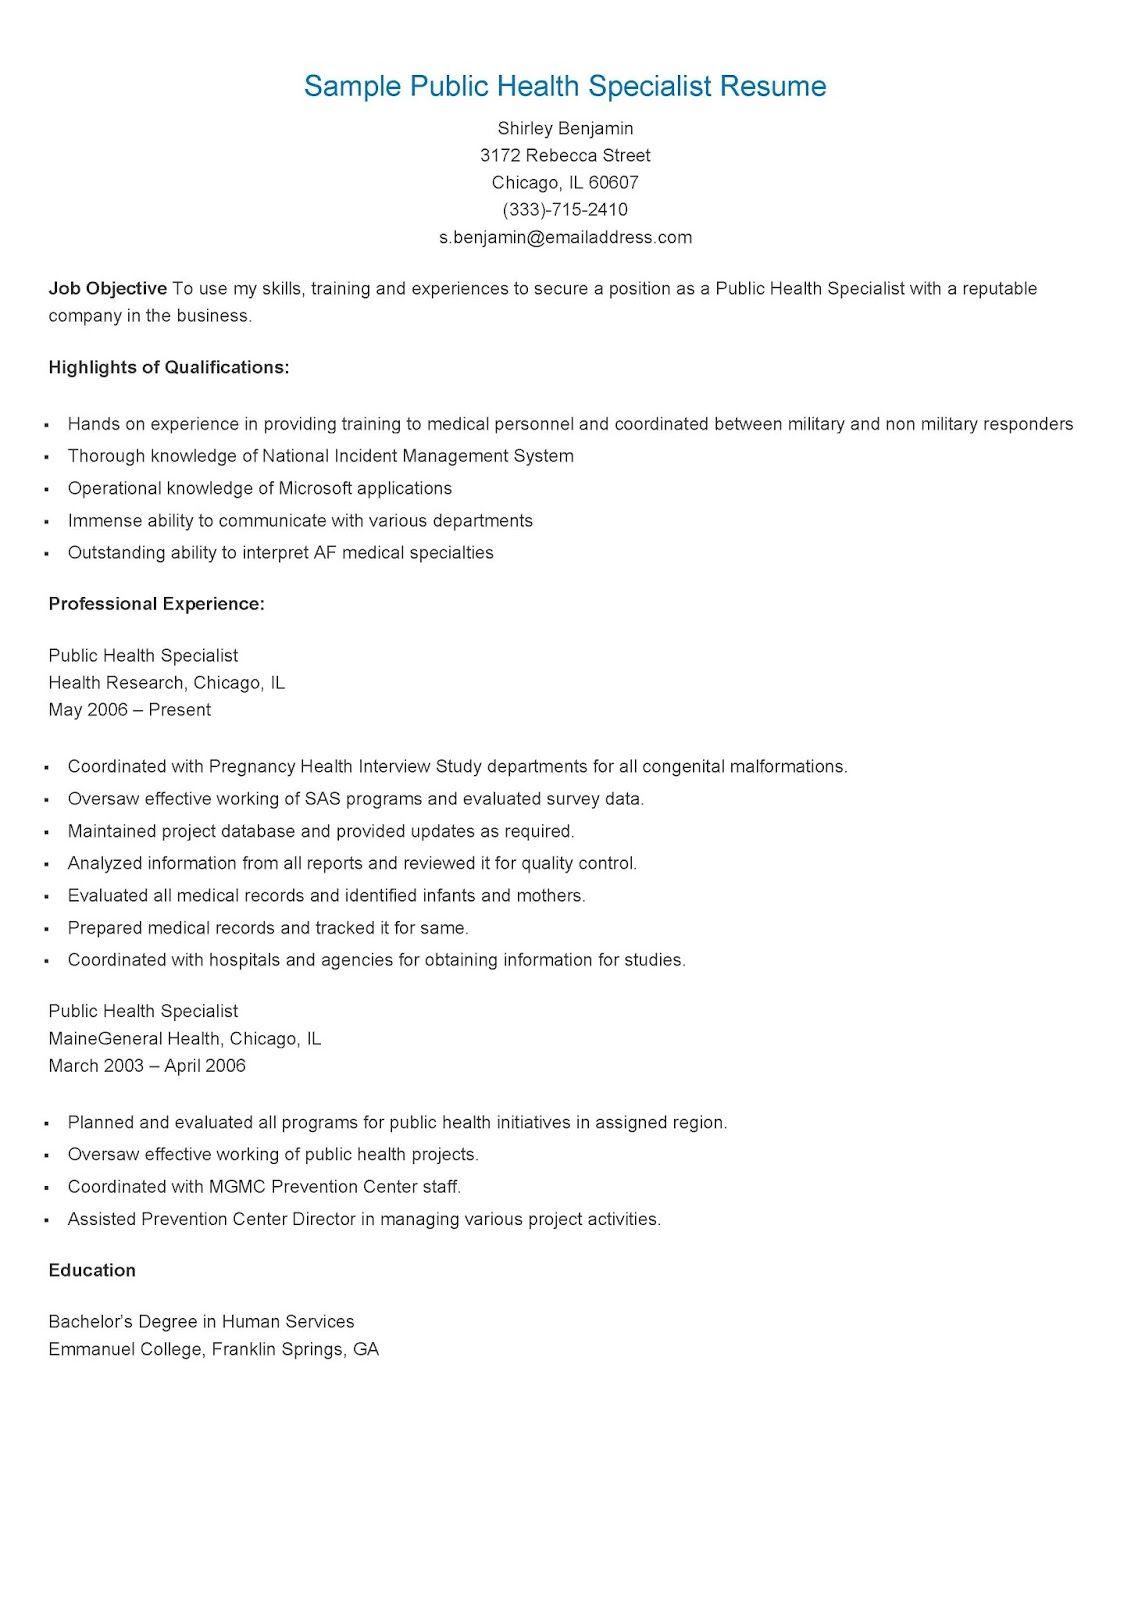 Sample Public Health Specialist Resume Resume Examples Public Health Jobs Public Health